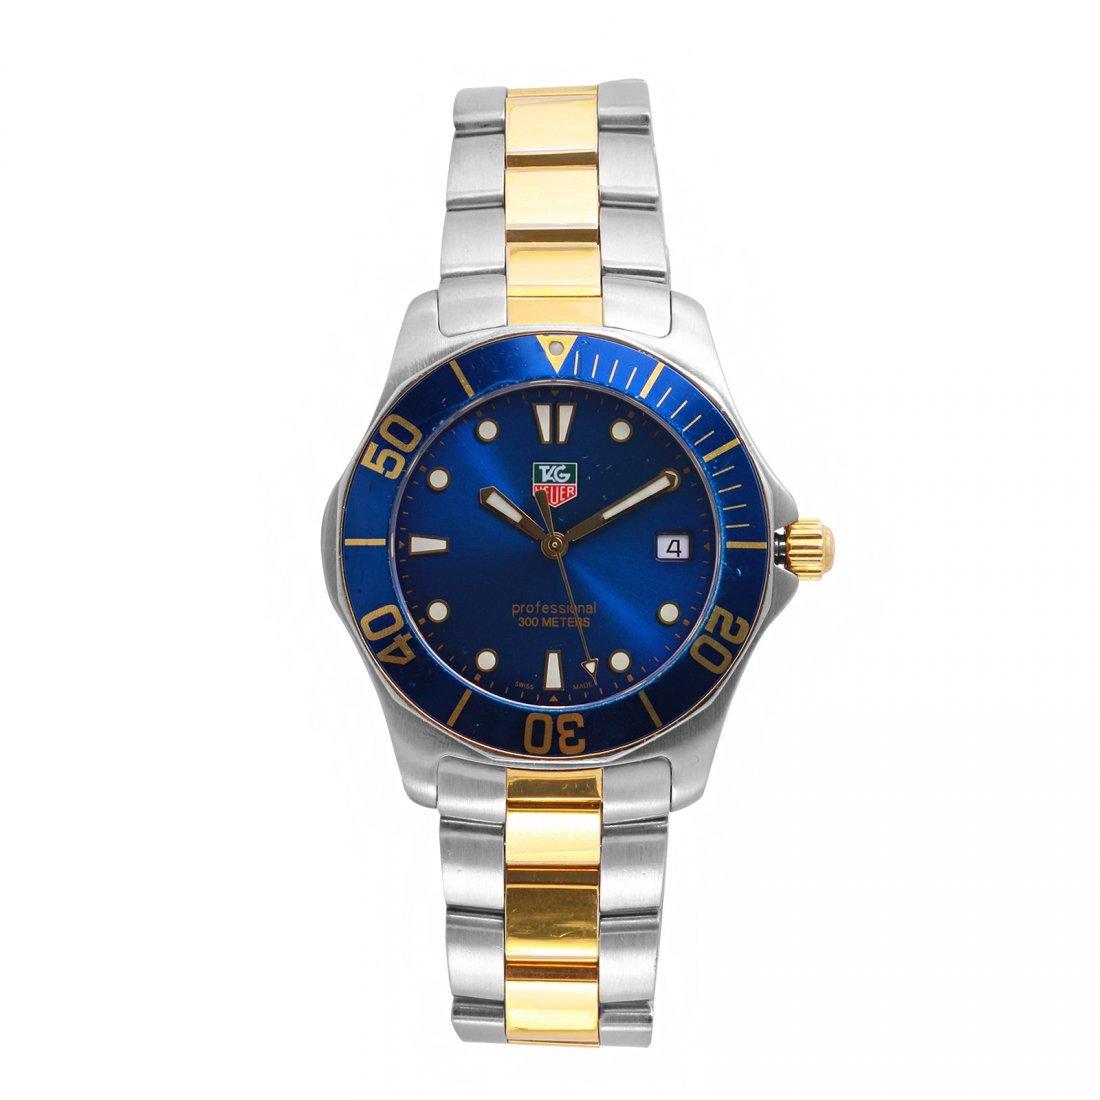 Men's Aquaracer Tag Heuer Two Tone Watch